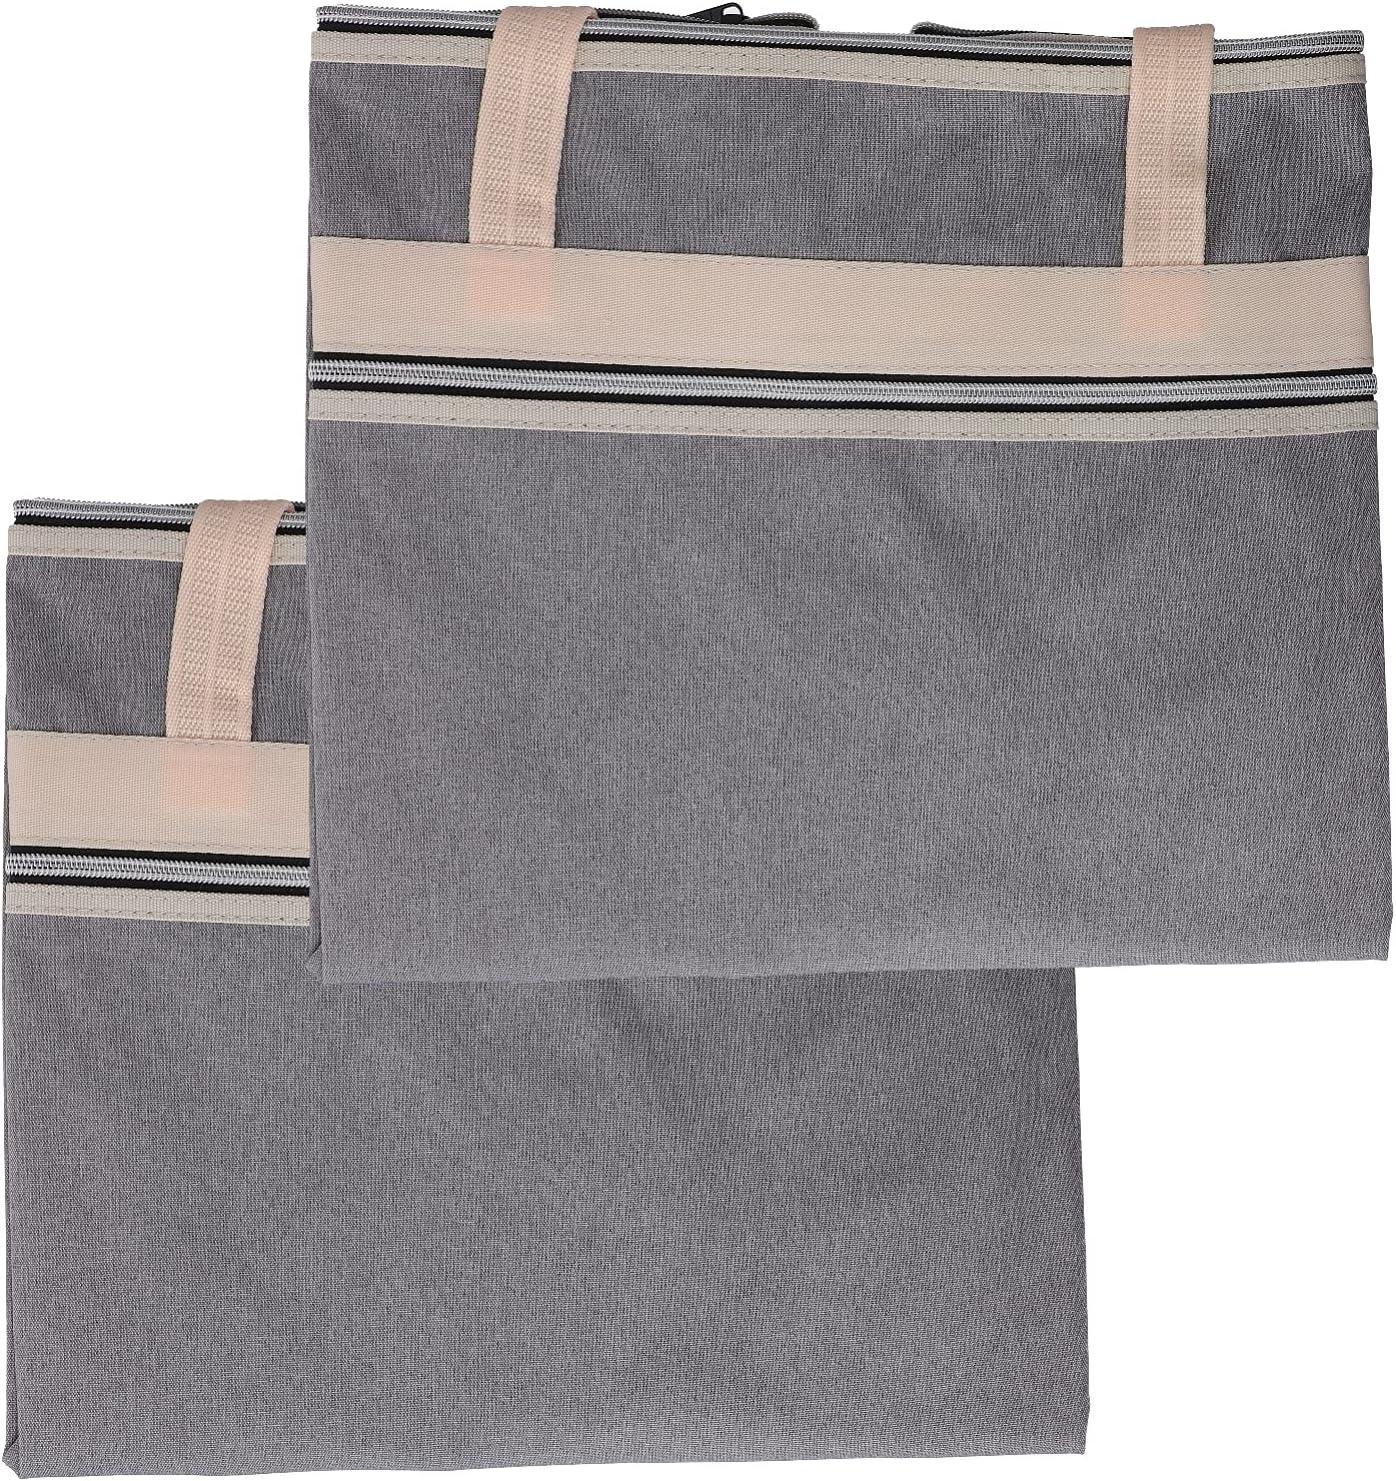 Healifty 2pcs Washington Mall Art Portfolio Bag Storage To Waterproof Poster New product type